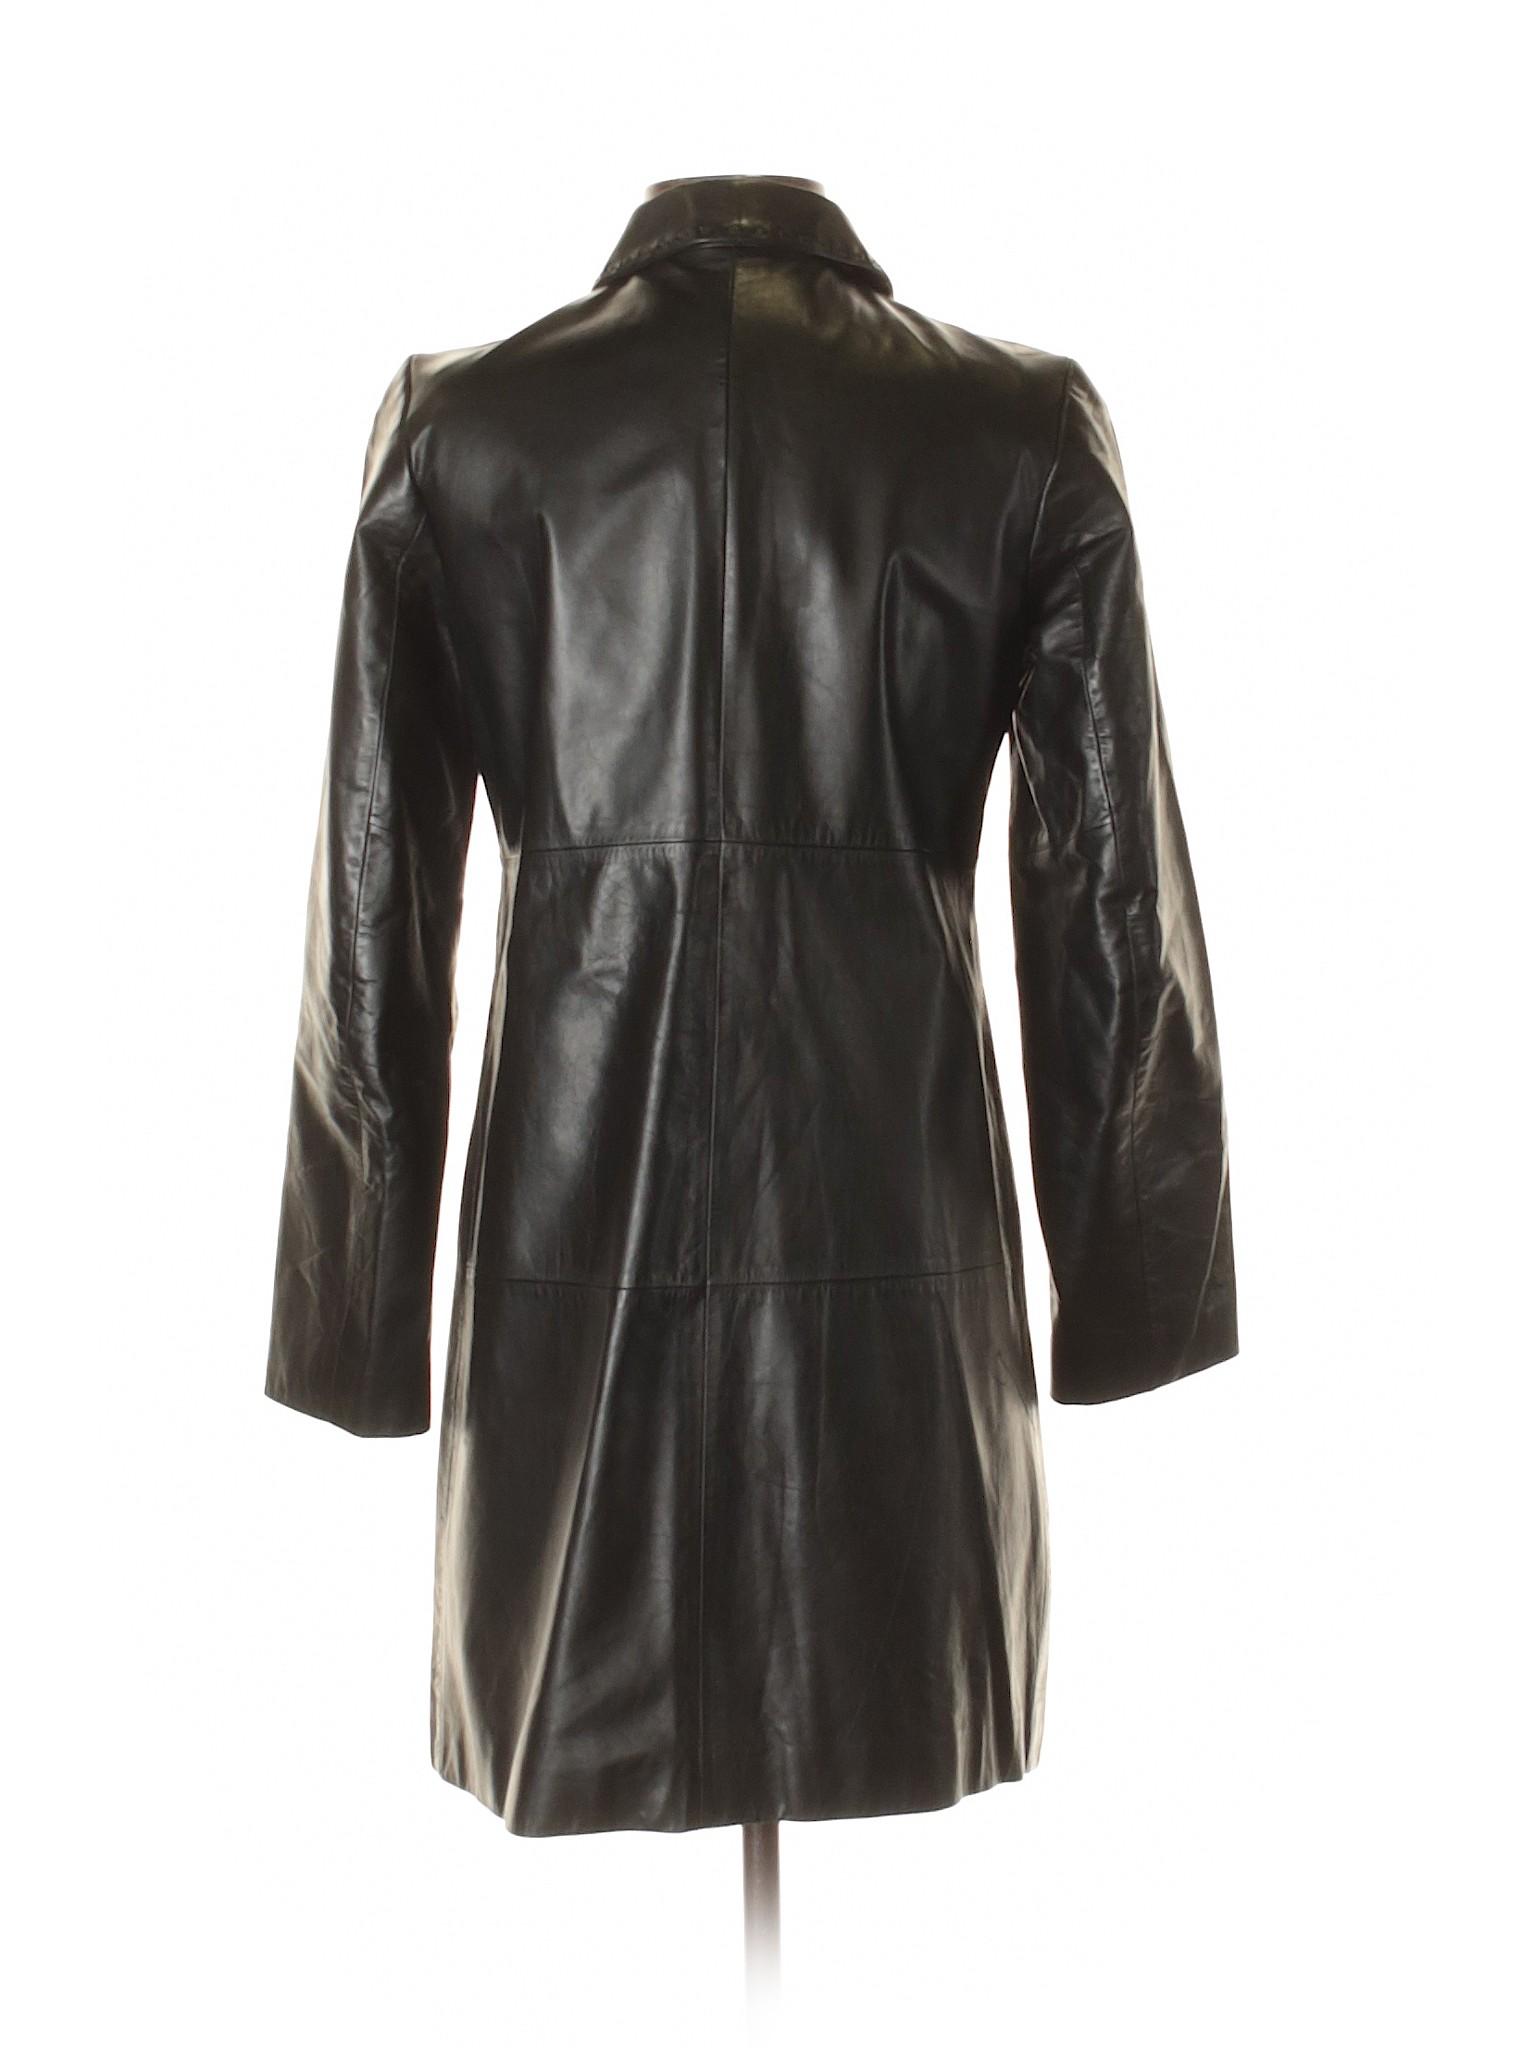 Leather Boutique Jacket Banana Republic leisure twrvTaqntf